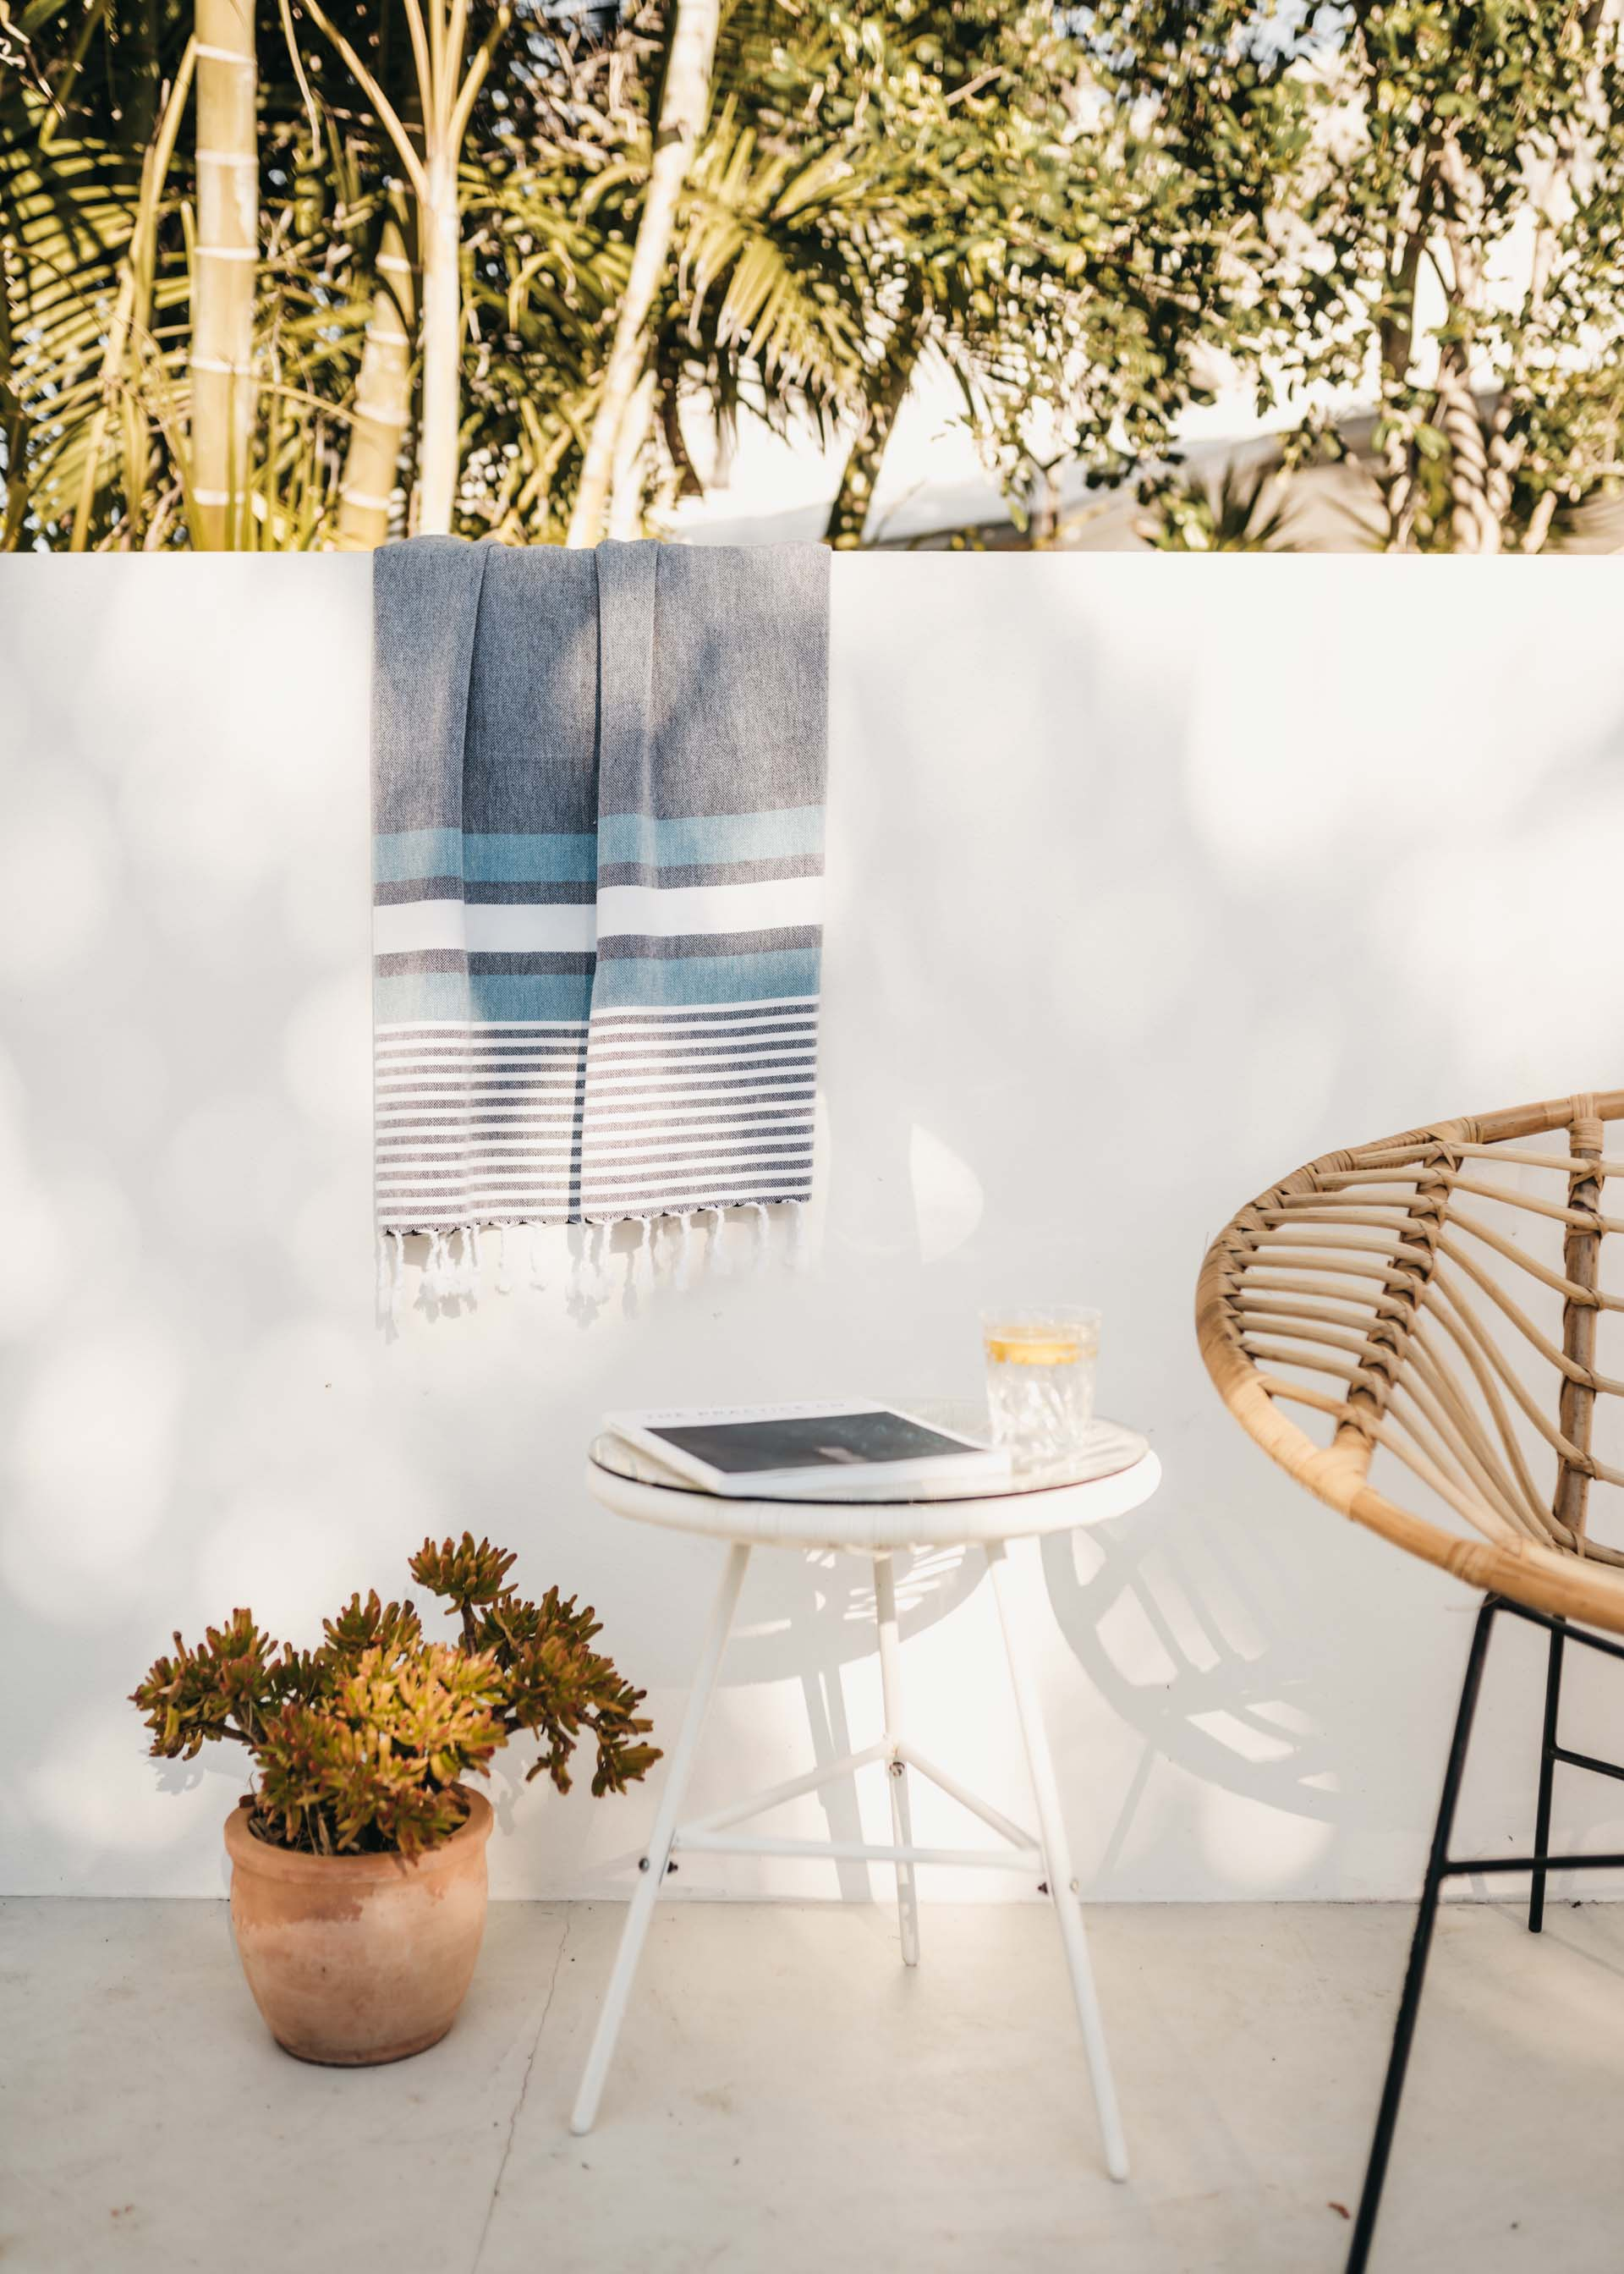 keira-mason-aegean-loom-turkish-towels-blue-backyard.jpg